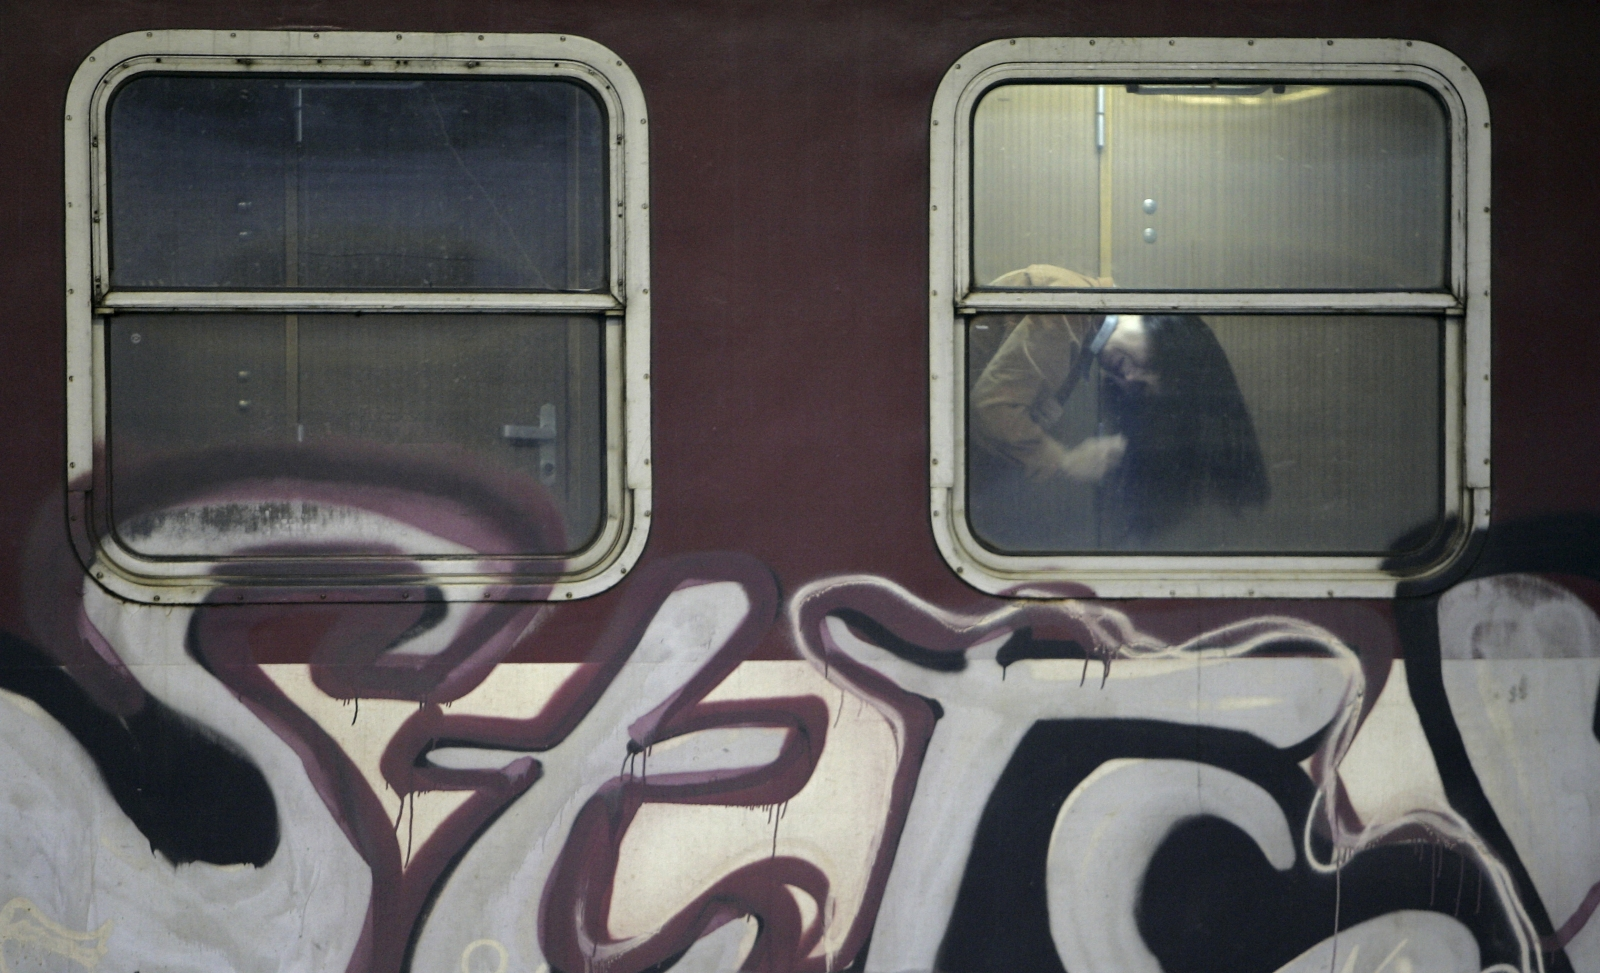 Graffiti on train